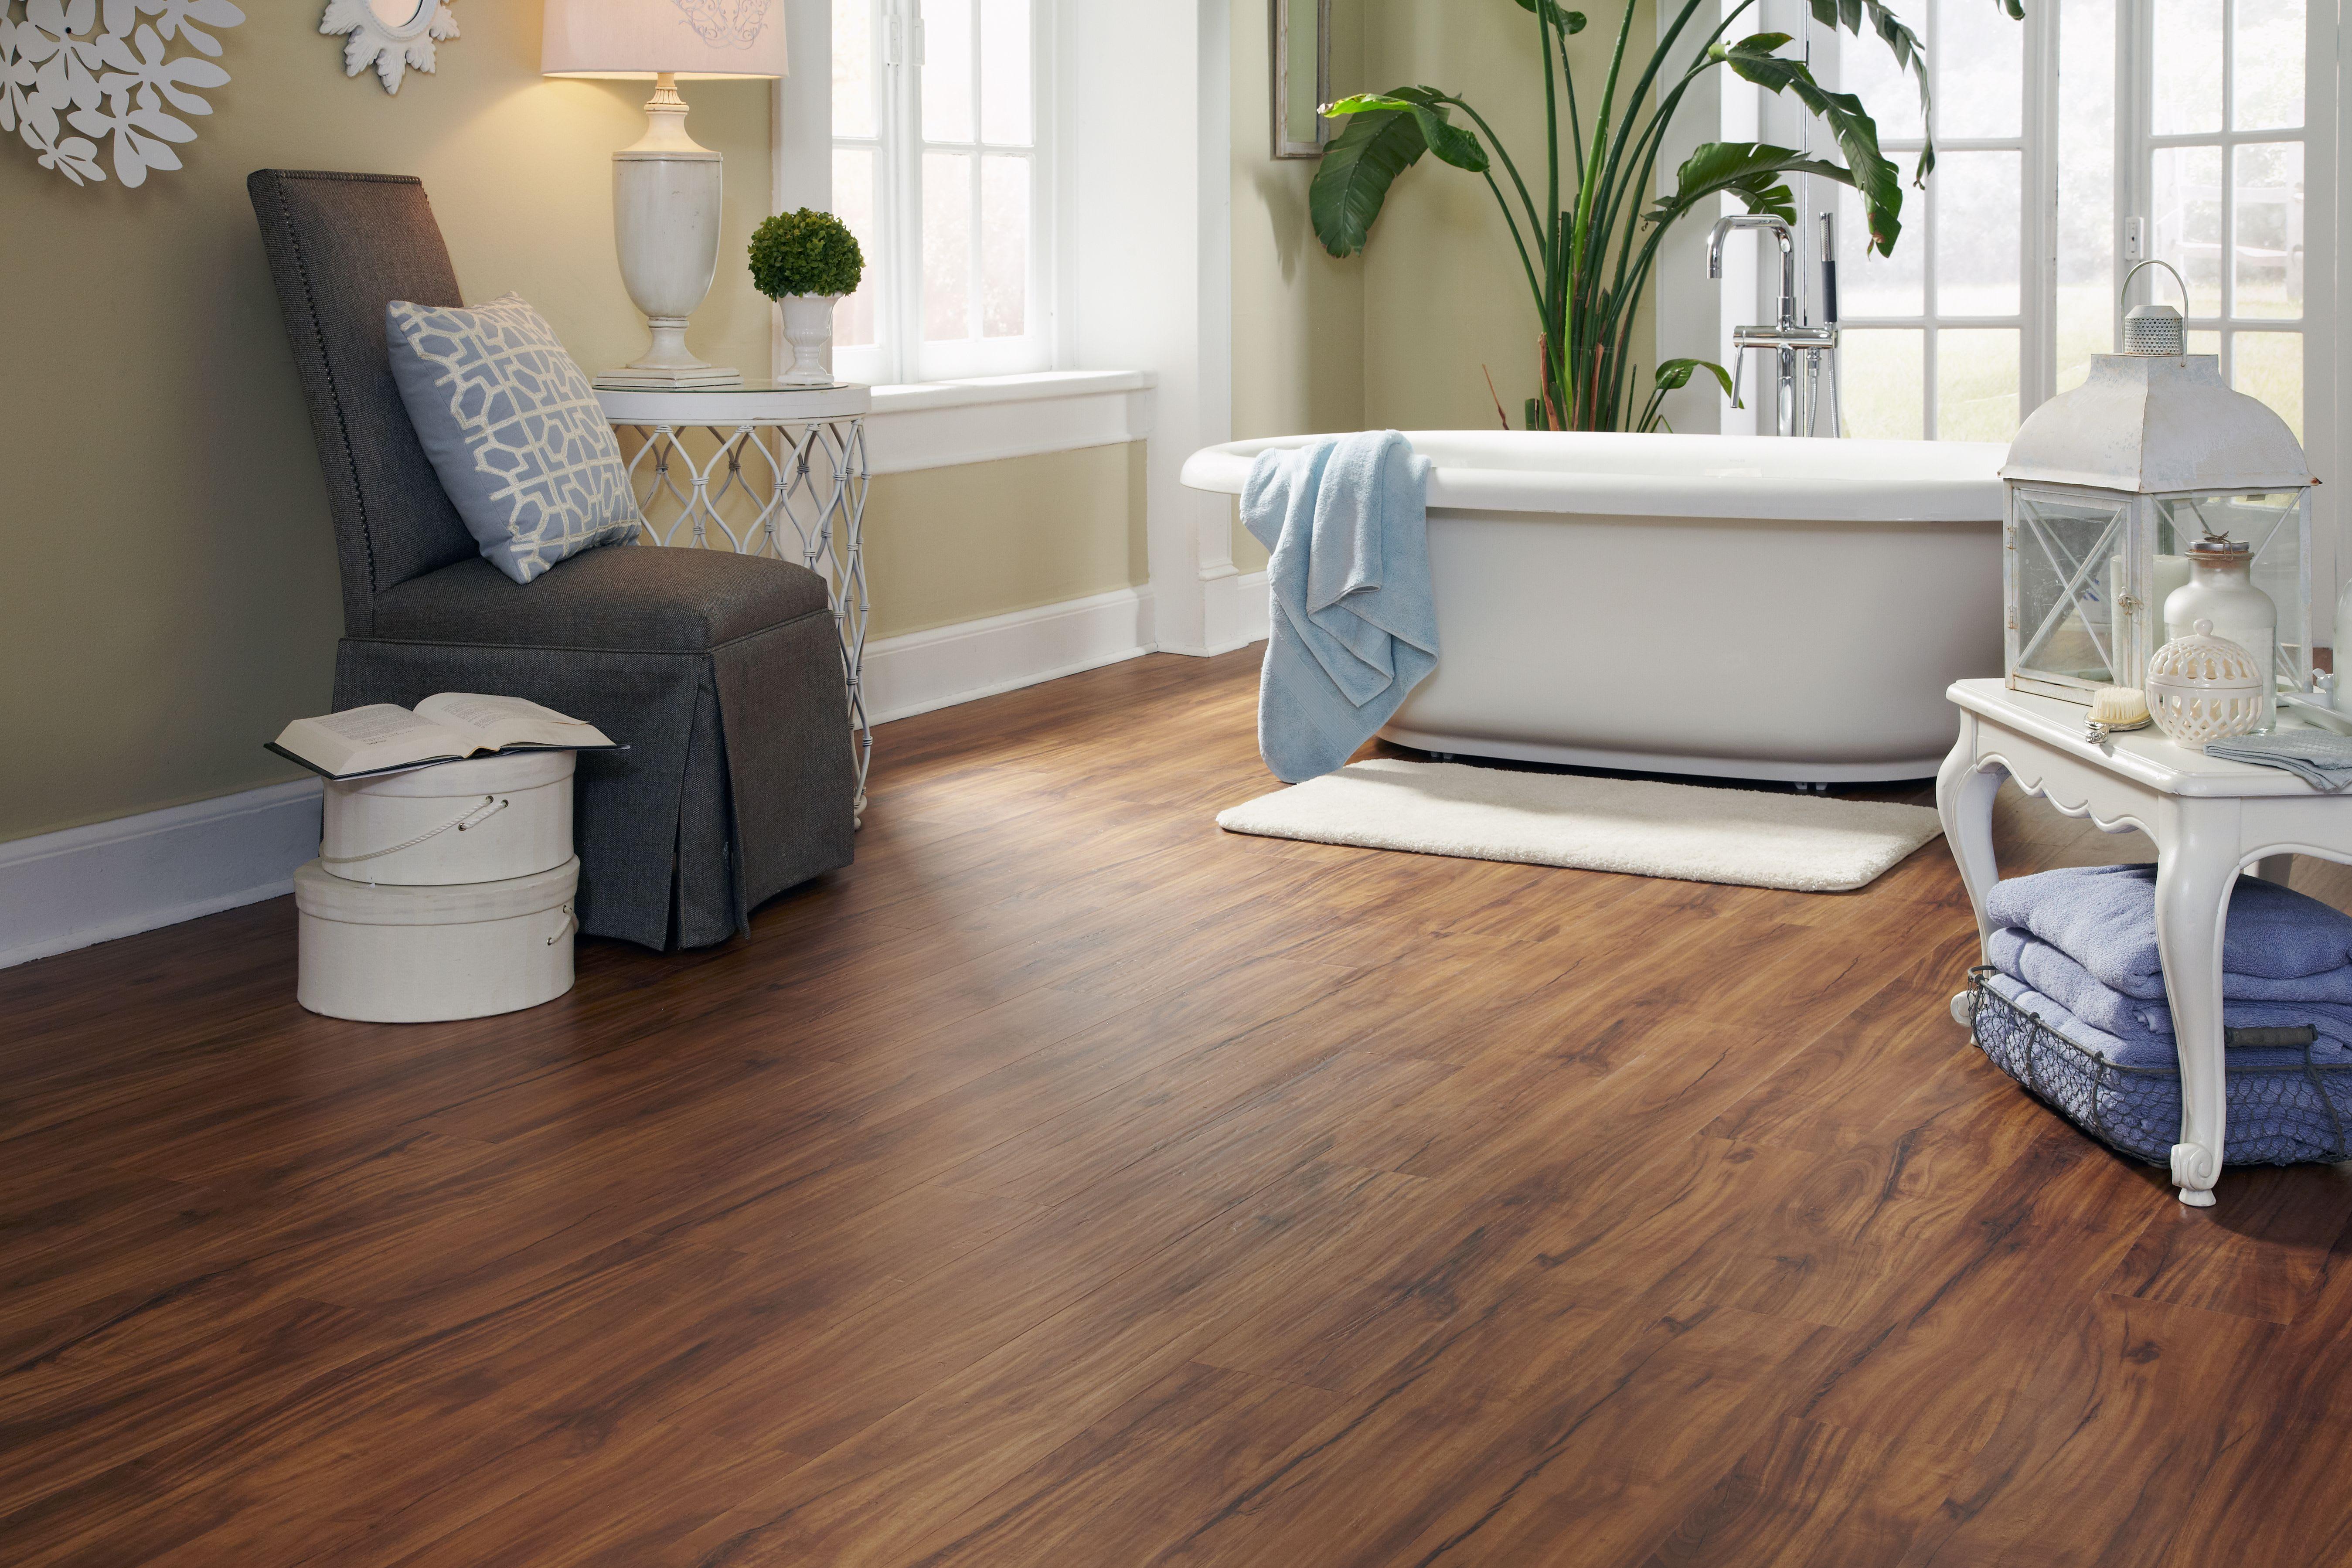 Tranquility Ultra 5mm Golden Teak Luxury Vinyl Plank Flooring - Lifetime Warranty